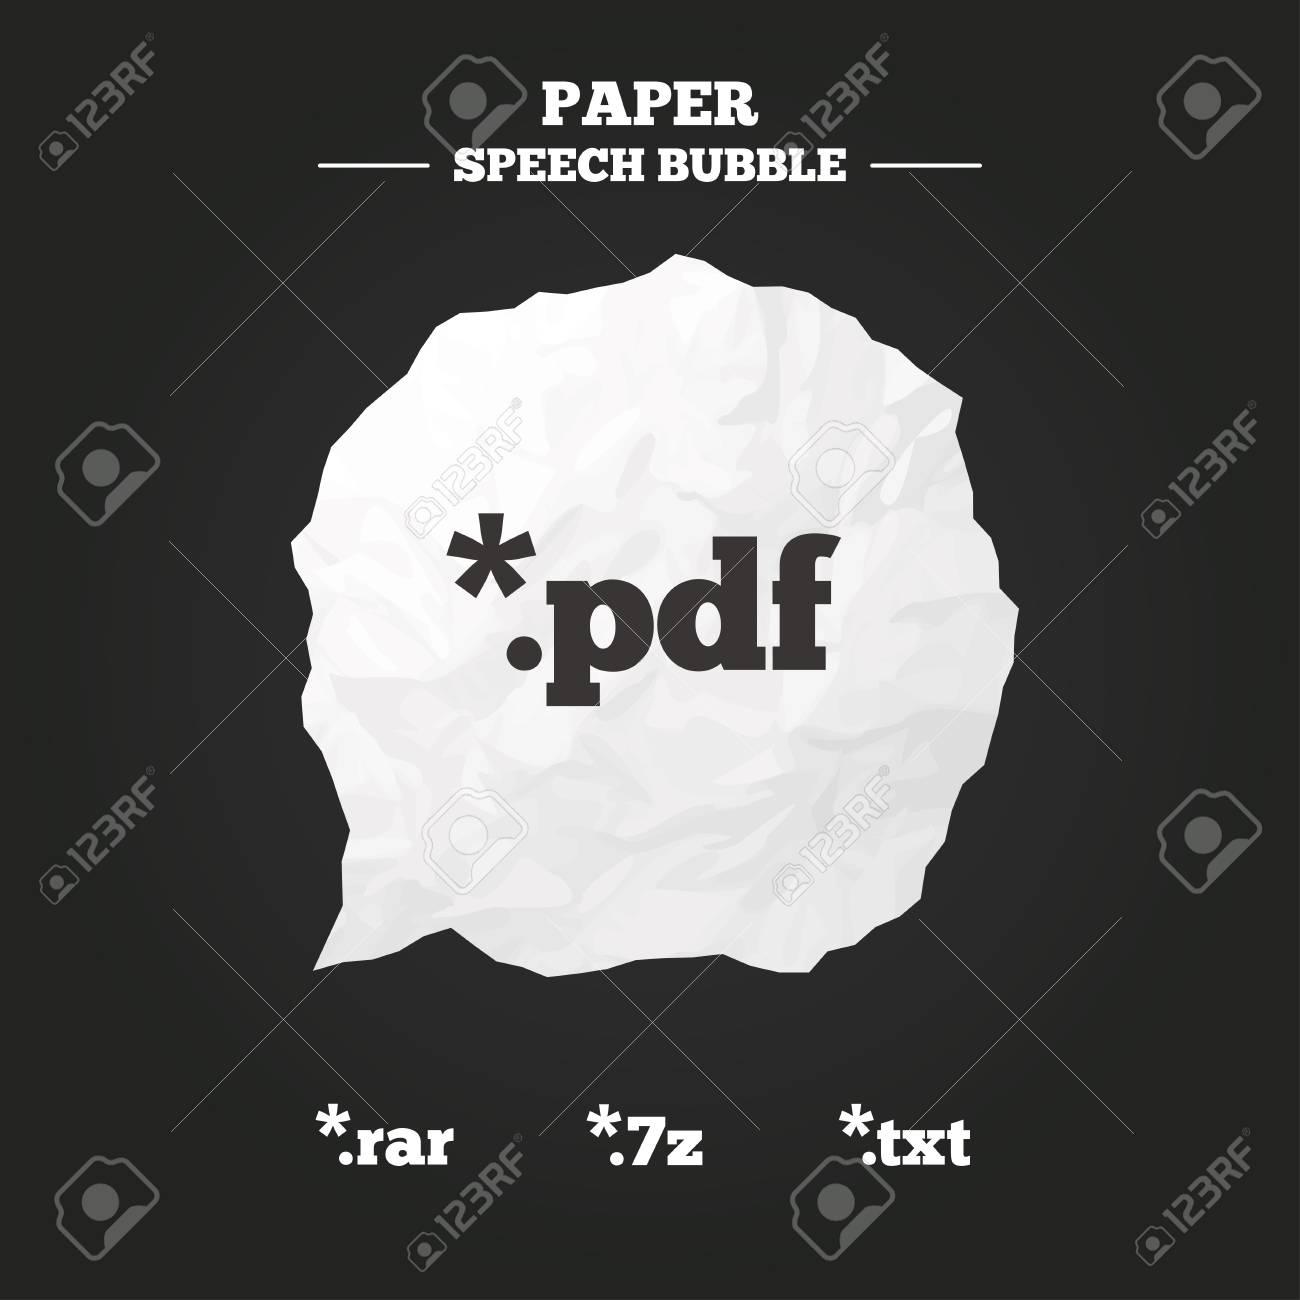 Document Icons File Extensions Symbols Pdf Rar 7z And Txt